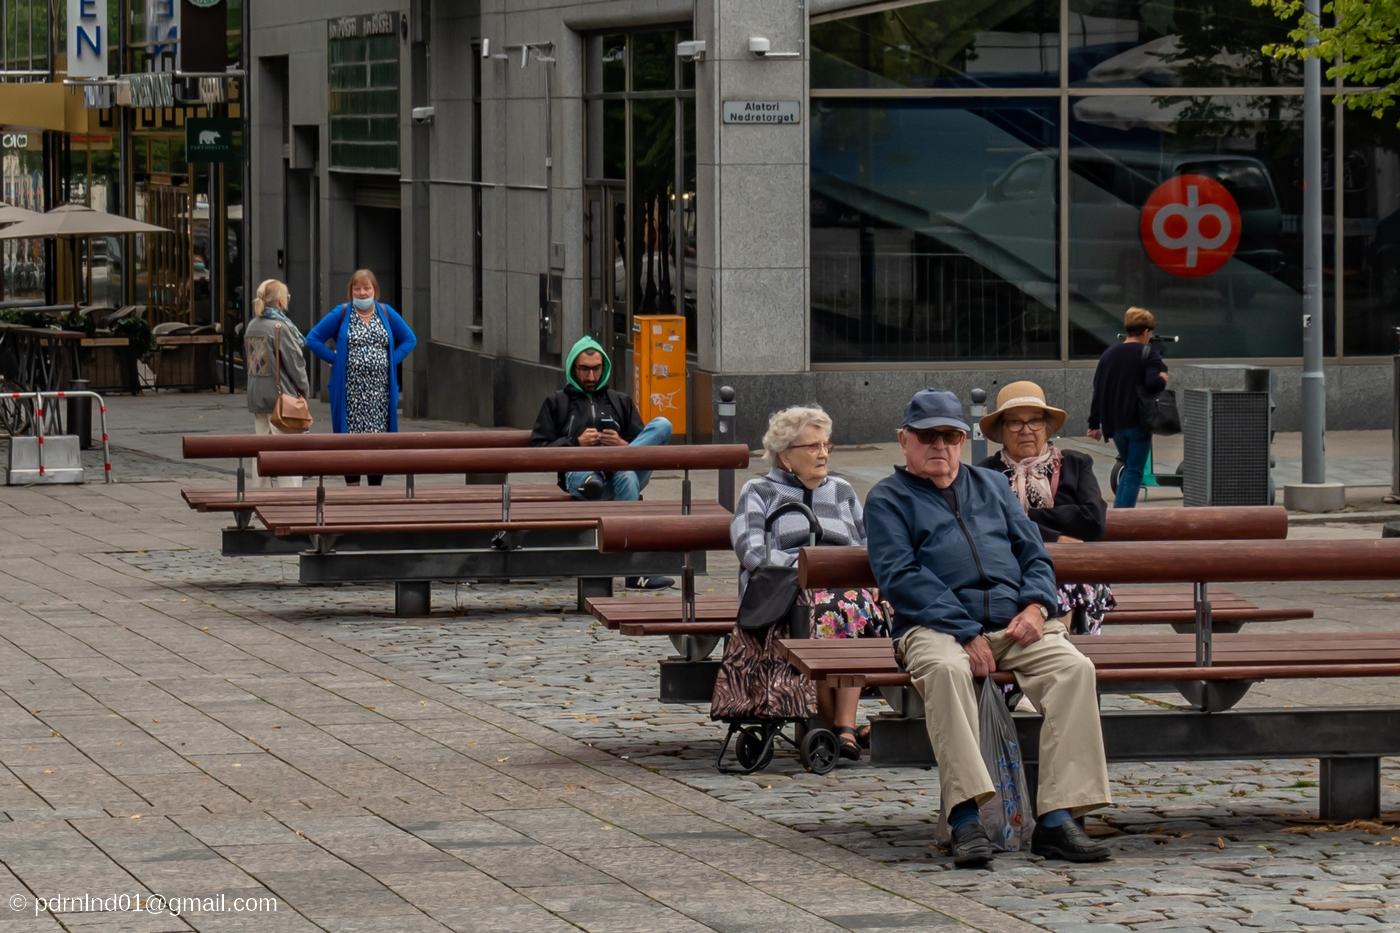 En fredag i Vasa